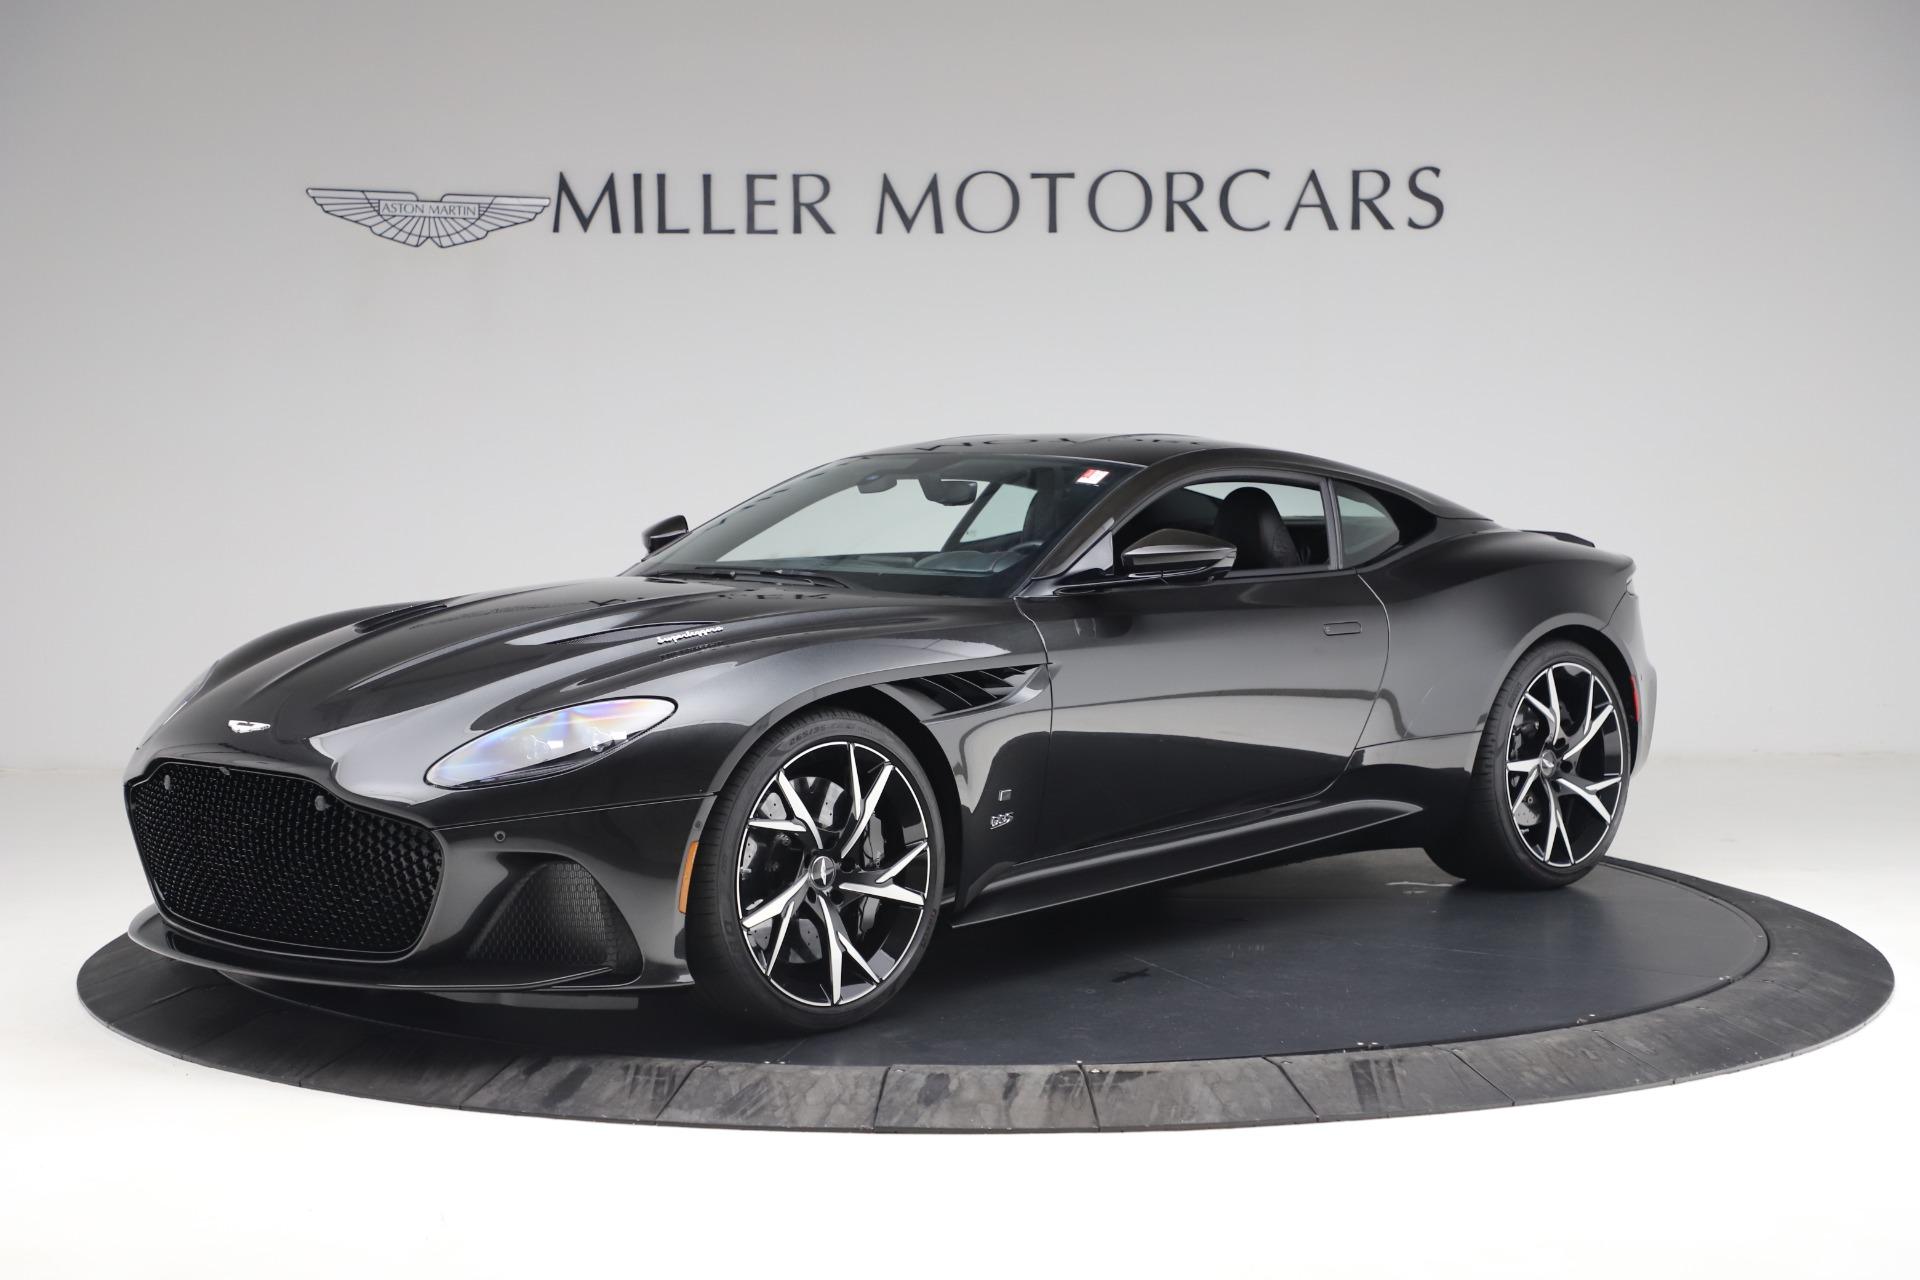 New 2021 Aston Martin DBS Superleggera 007 for sale $391,211 at Pagani of Greenwich in Greenwich CT 06830 1